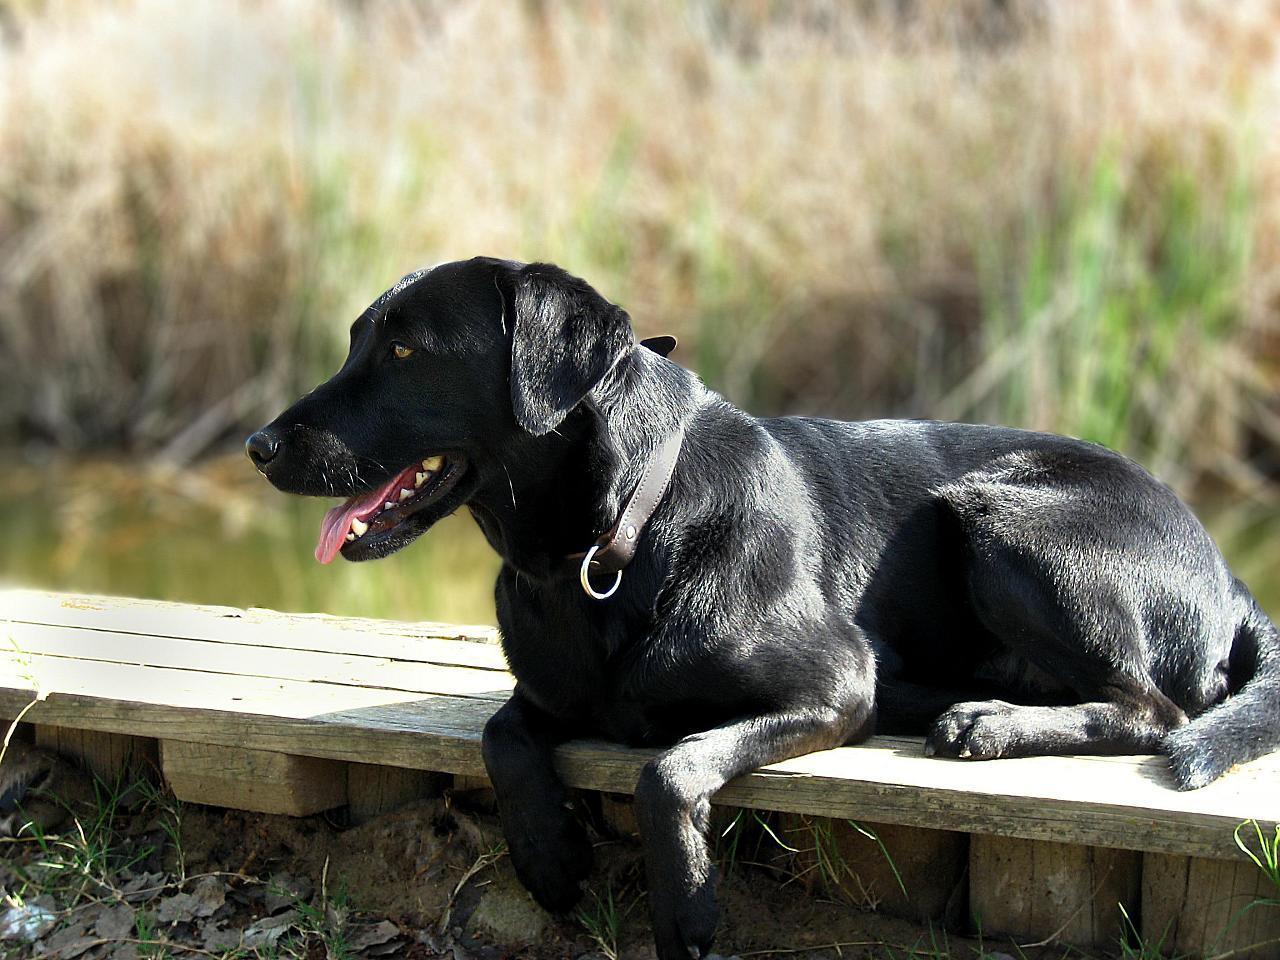 Black Labrador Retriever Puppies For Sale | Brockton, MA #322288